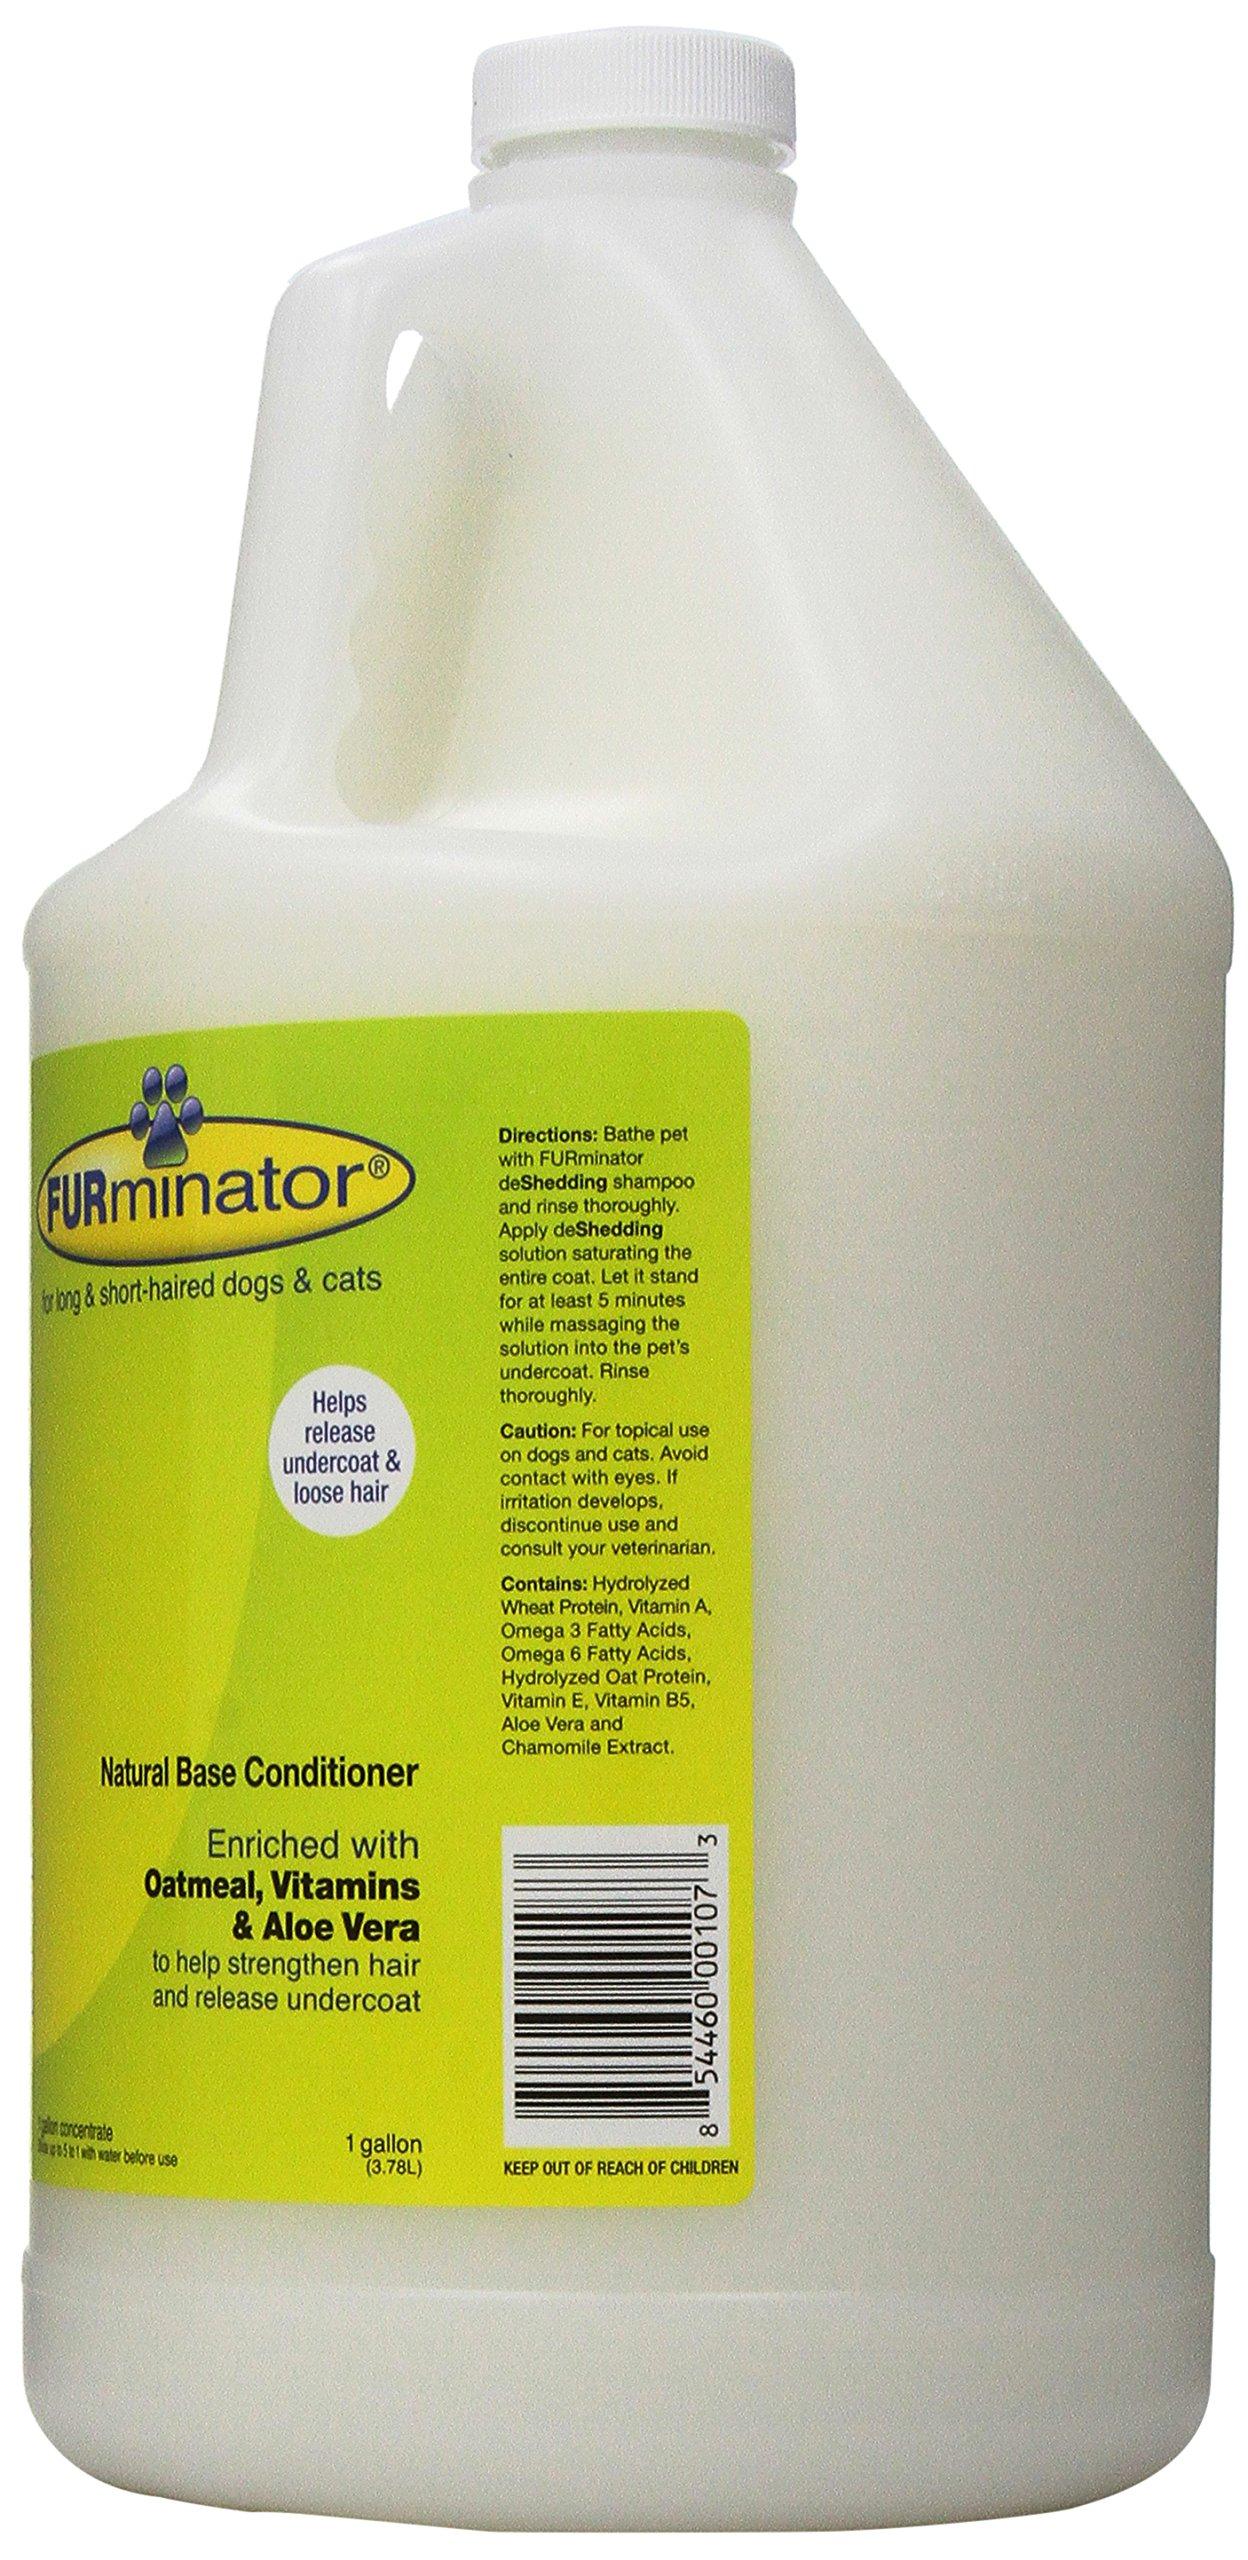 Furminator deShedding Ultra Premium Dog Conditioner, 1-Gallon